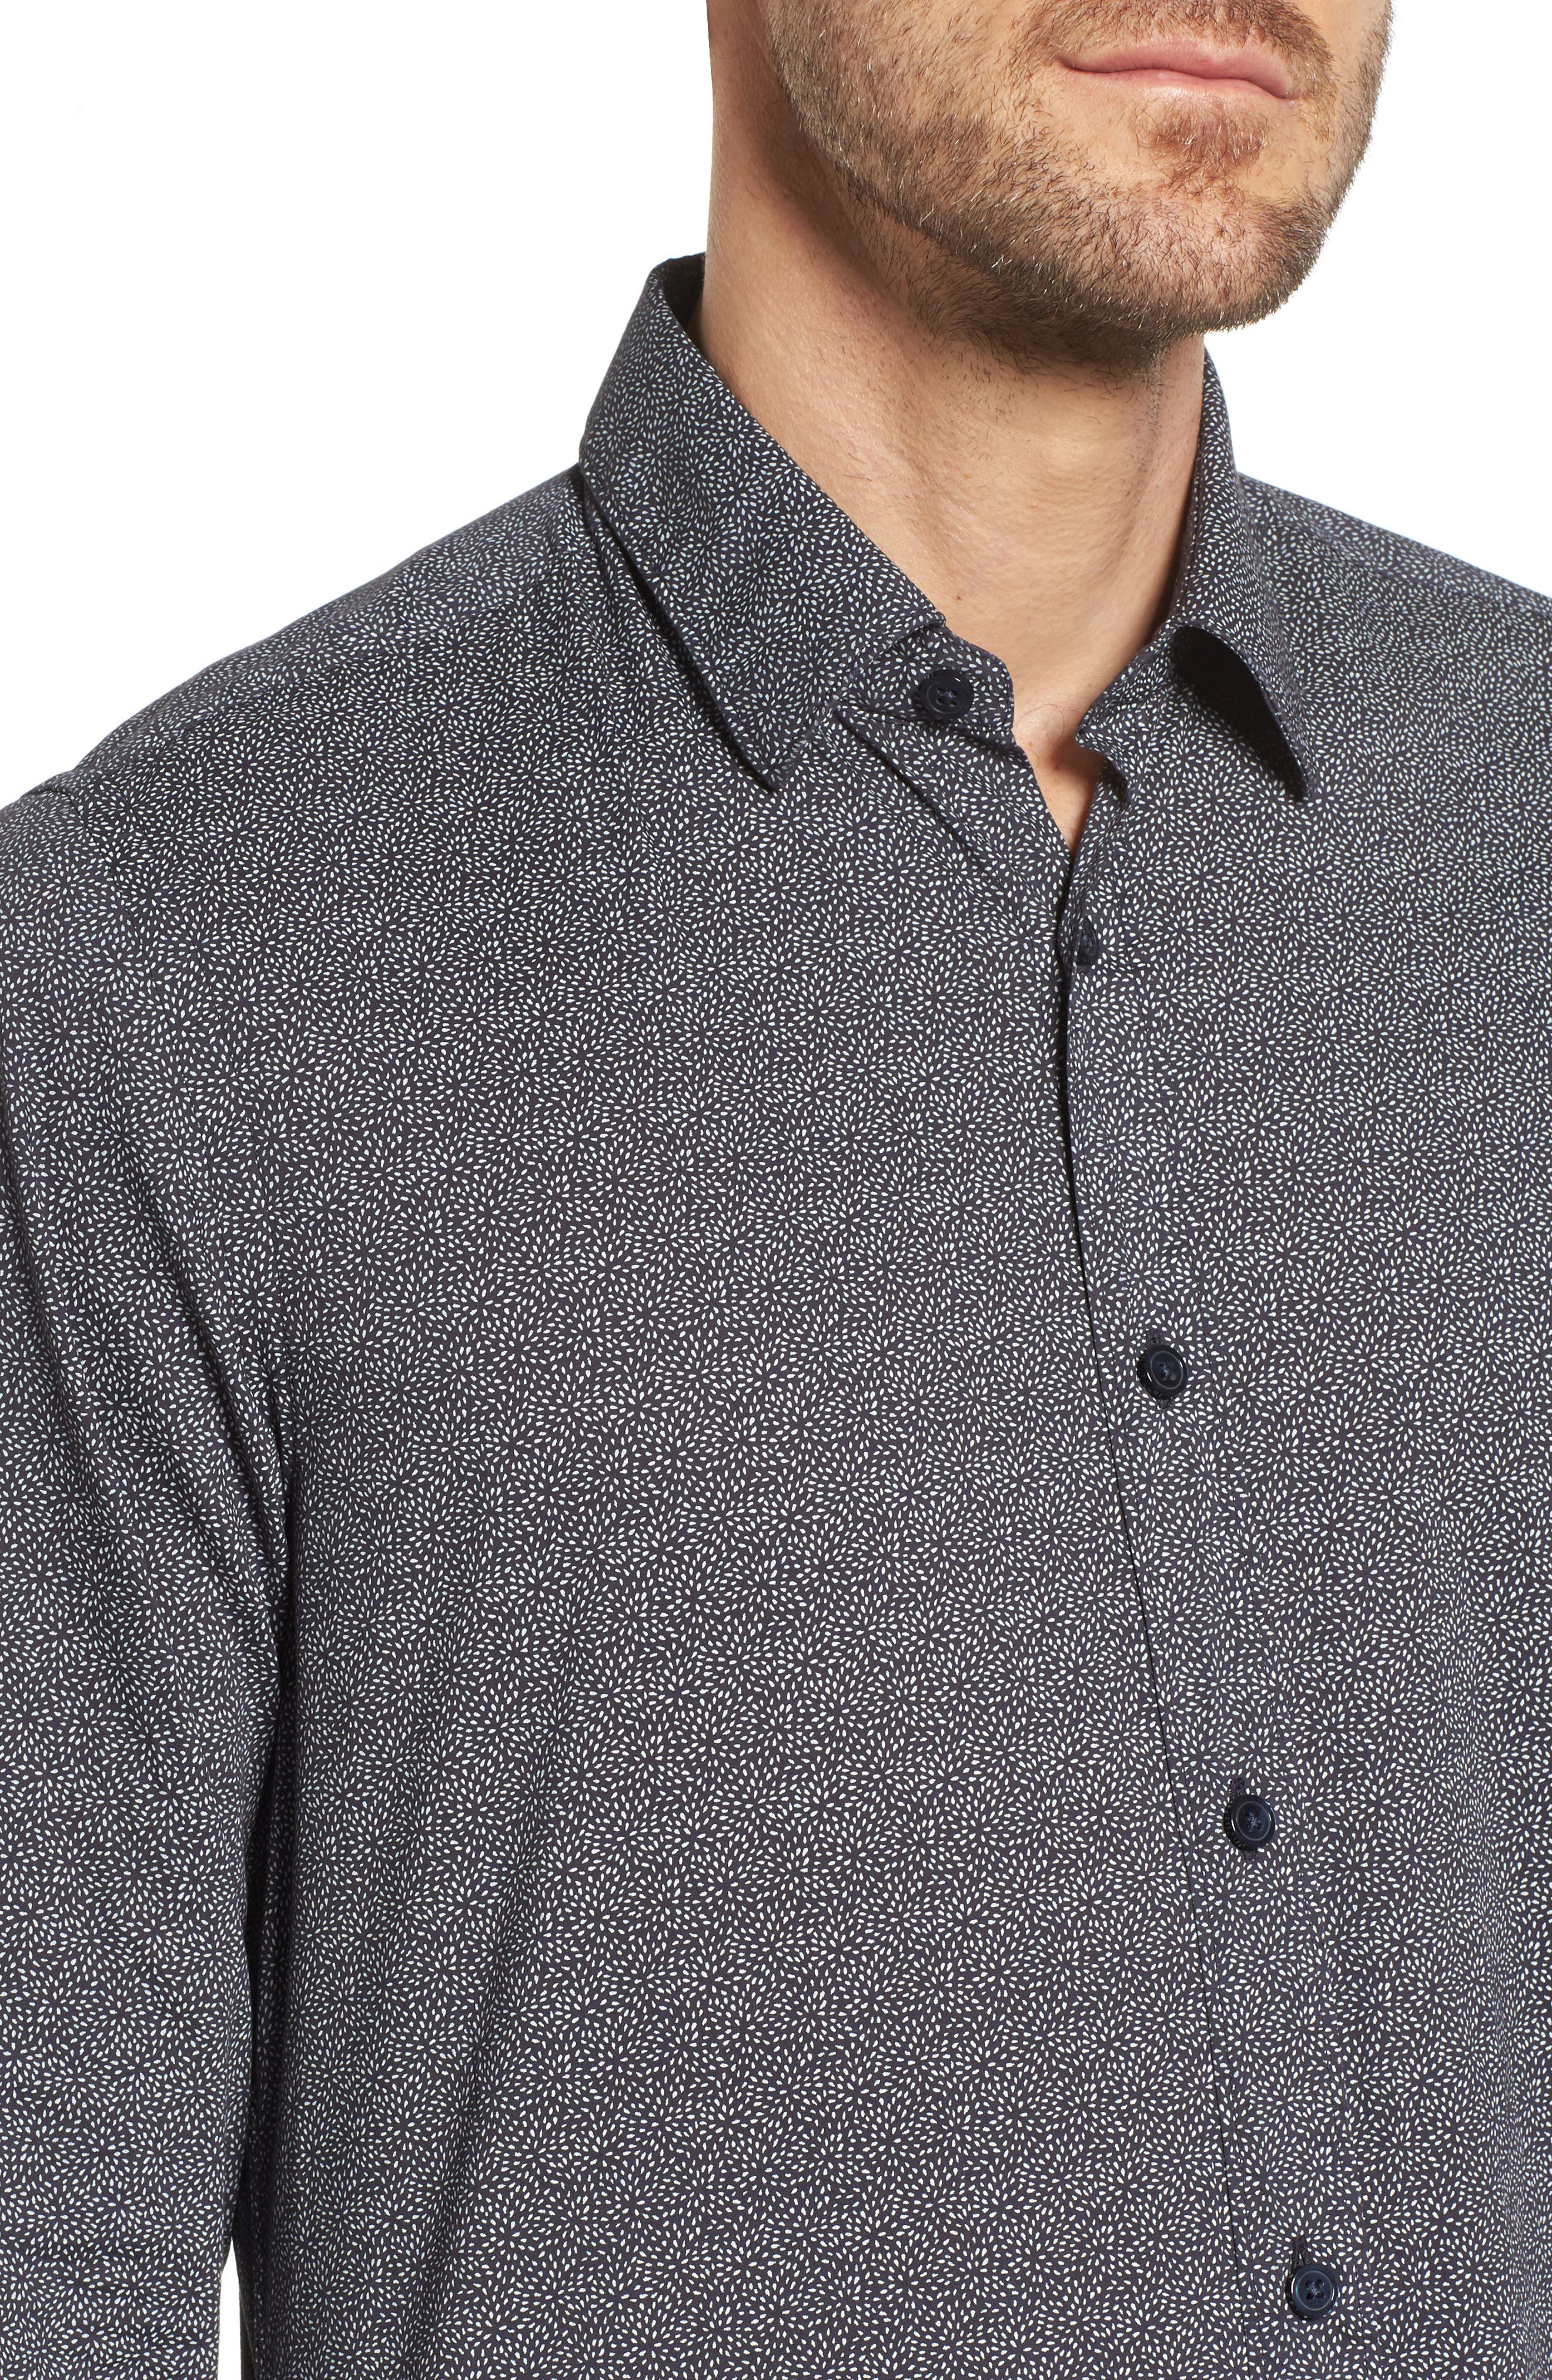 Lukas Regular Fit Print Sport Shirt,                             Alternate thumbnail 4, color,                             410